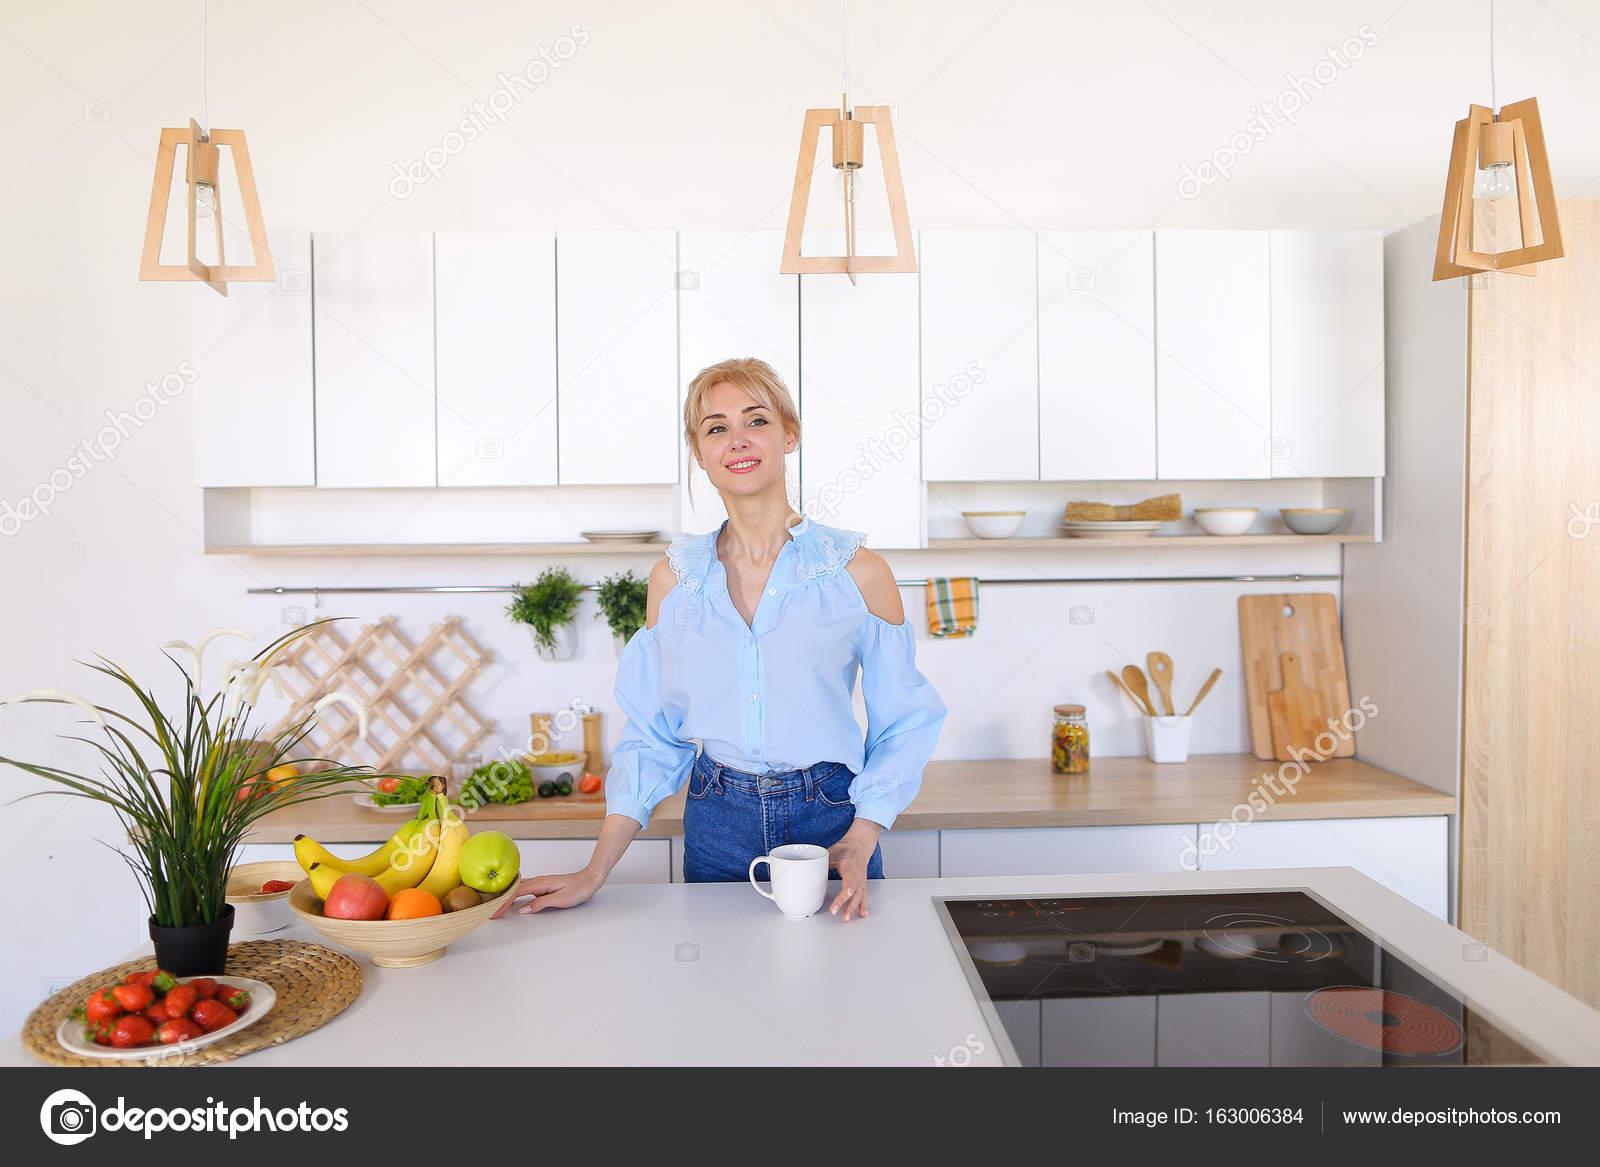 nice kitchen tables planning tools 漂亮的女孩走进了厨房和伸展运动 享受早晨c 图库照片 c sisterspro 有魅力的女人走过来和去厨房的桌子 举起双手向两侧上下能缓解紧张和花费手香早上新鲜咖啡 用轻松的笑容 站在中间的笑